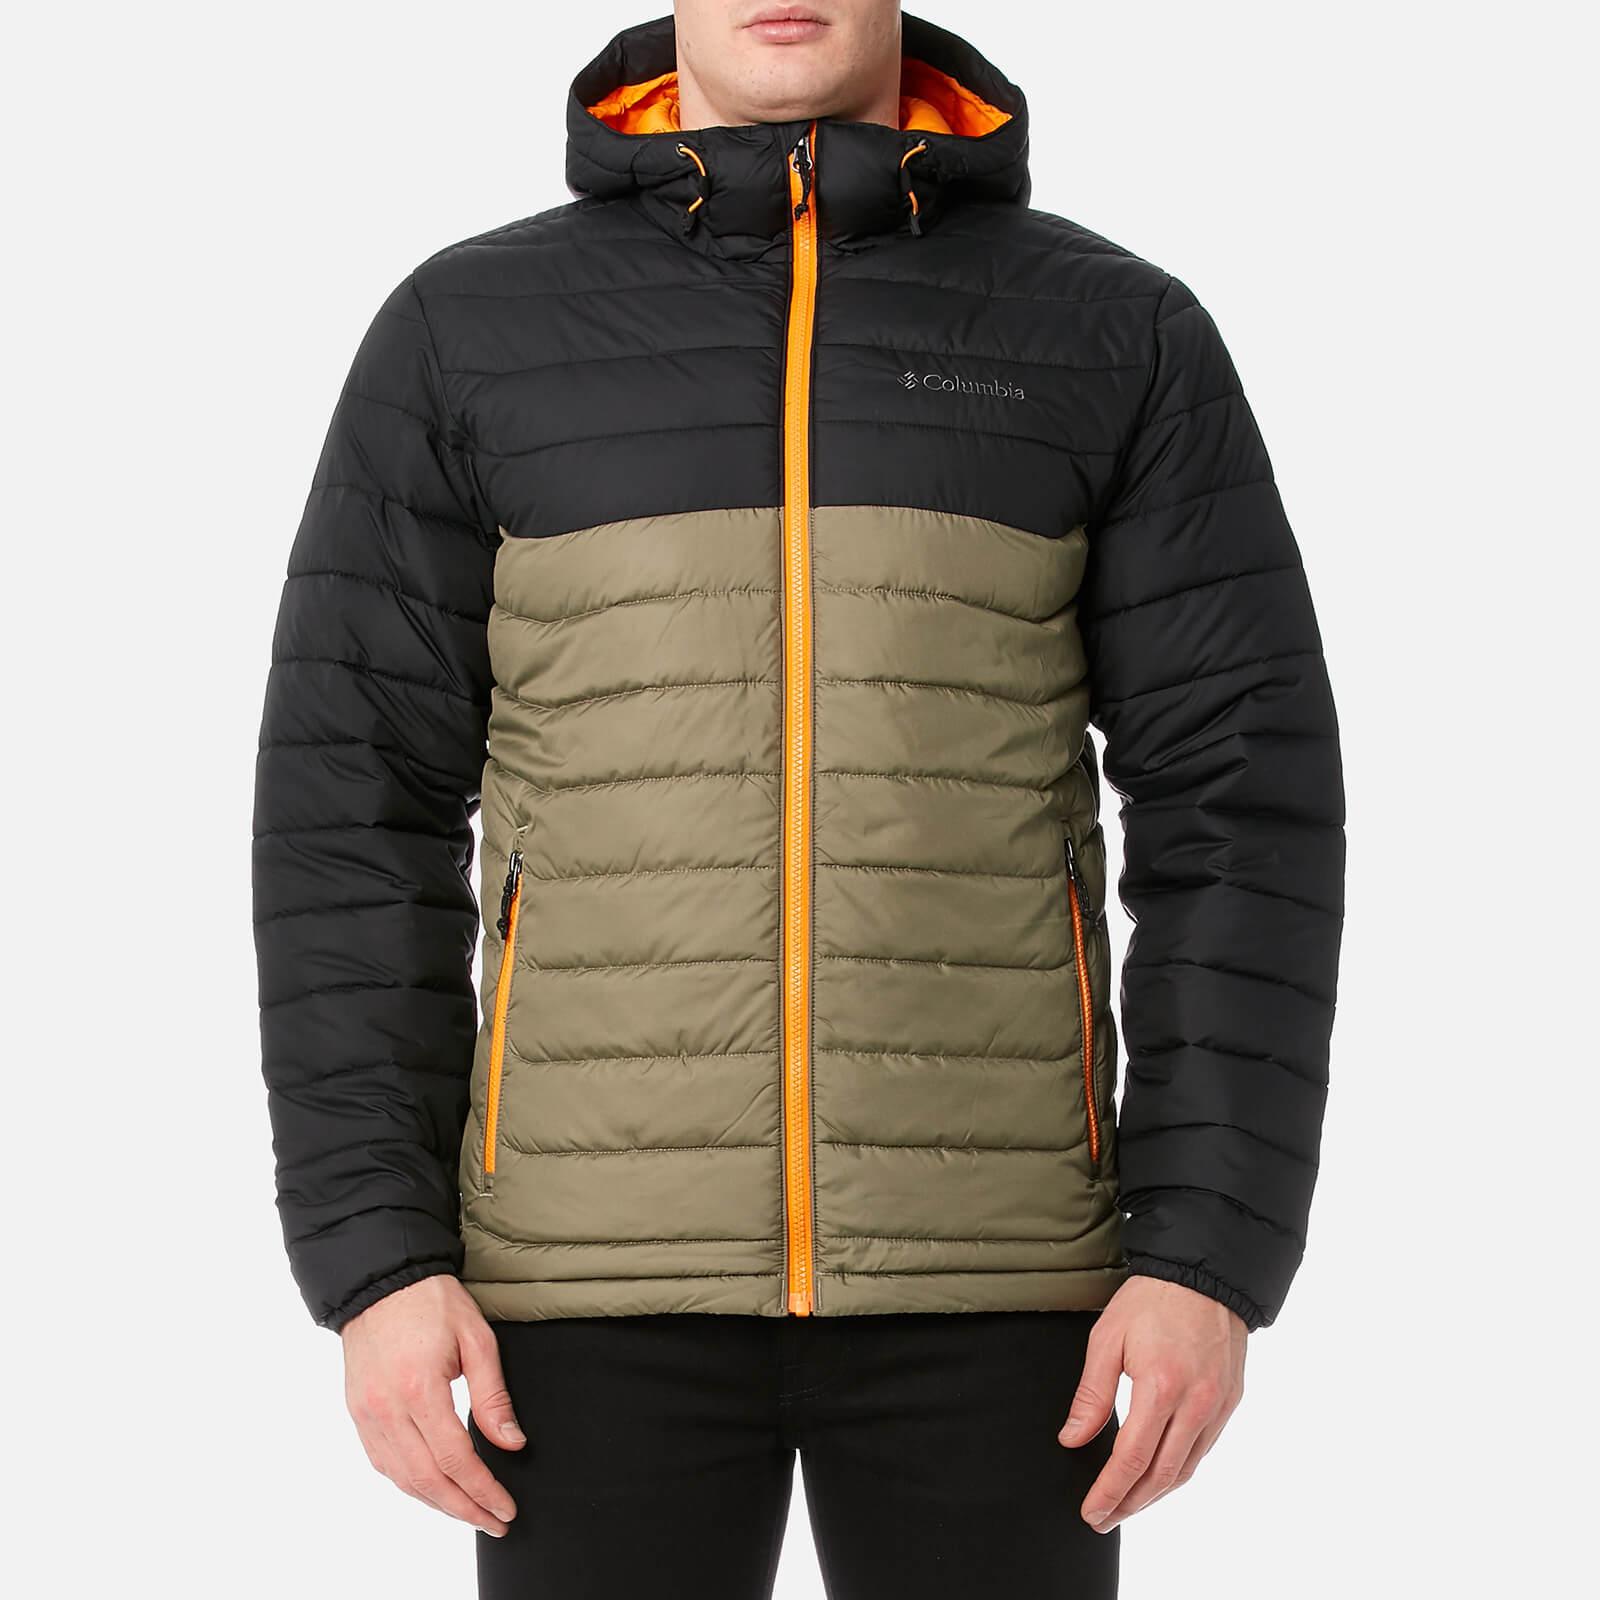 4a1d6e60 Columbia Men's Powder Lite Hooded Jacket - Sage/Black/Solarize Clothing |  TheHut.com